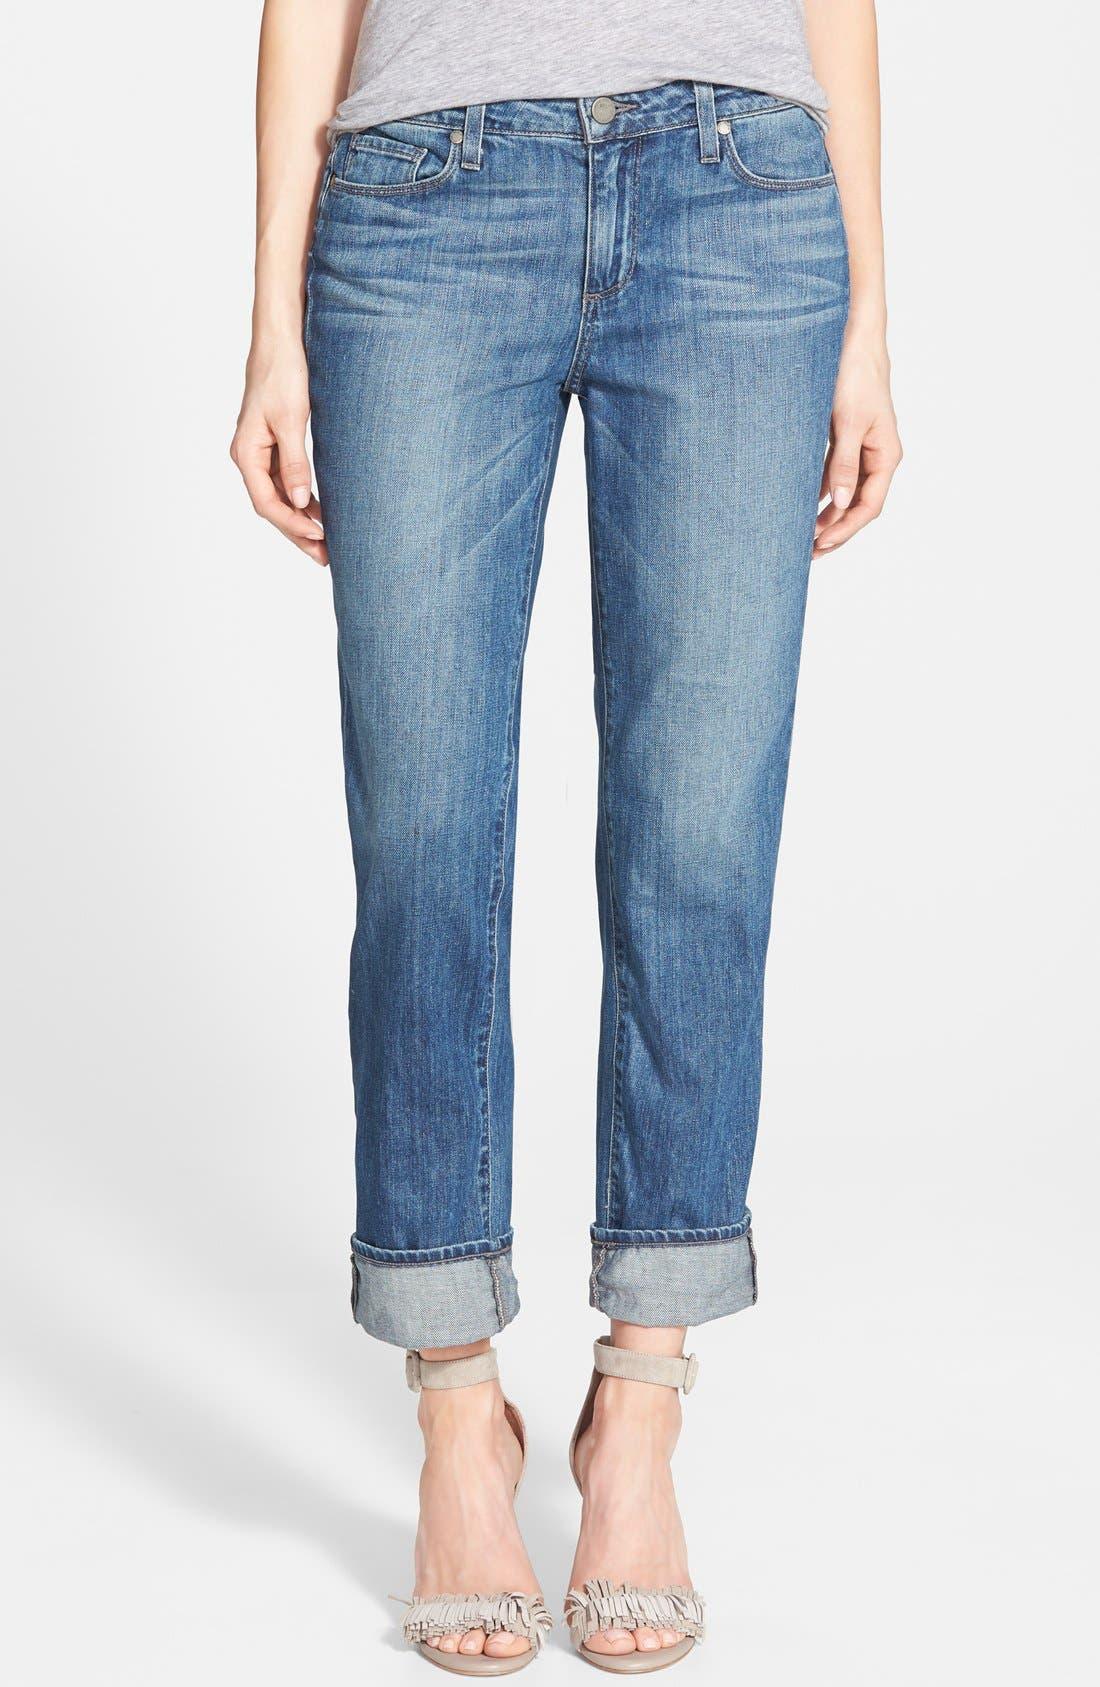 Alternate Image 1 Selected - Paige Denim 'Porter' Boyfriend Jeans (Dazely)